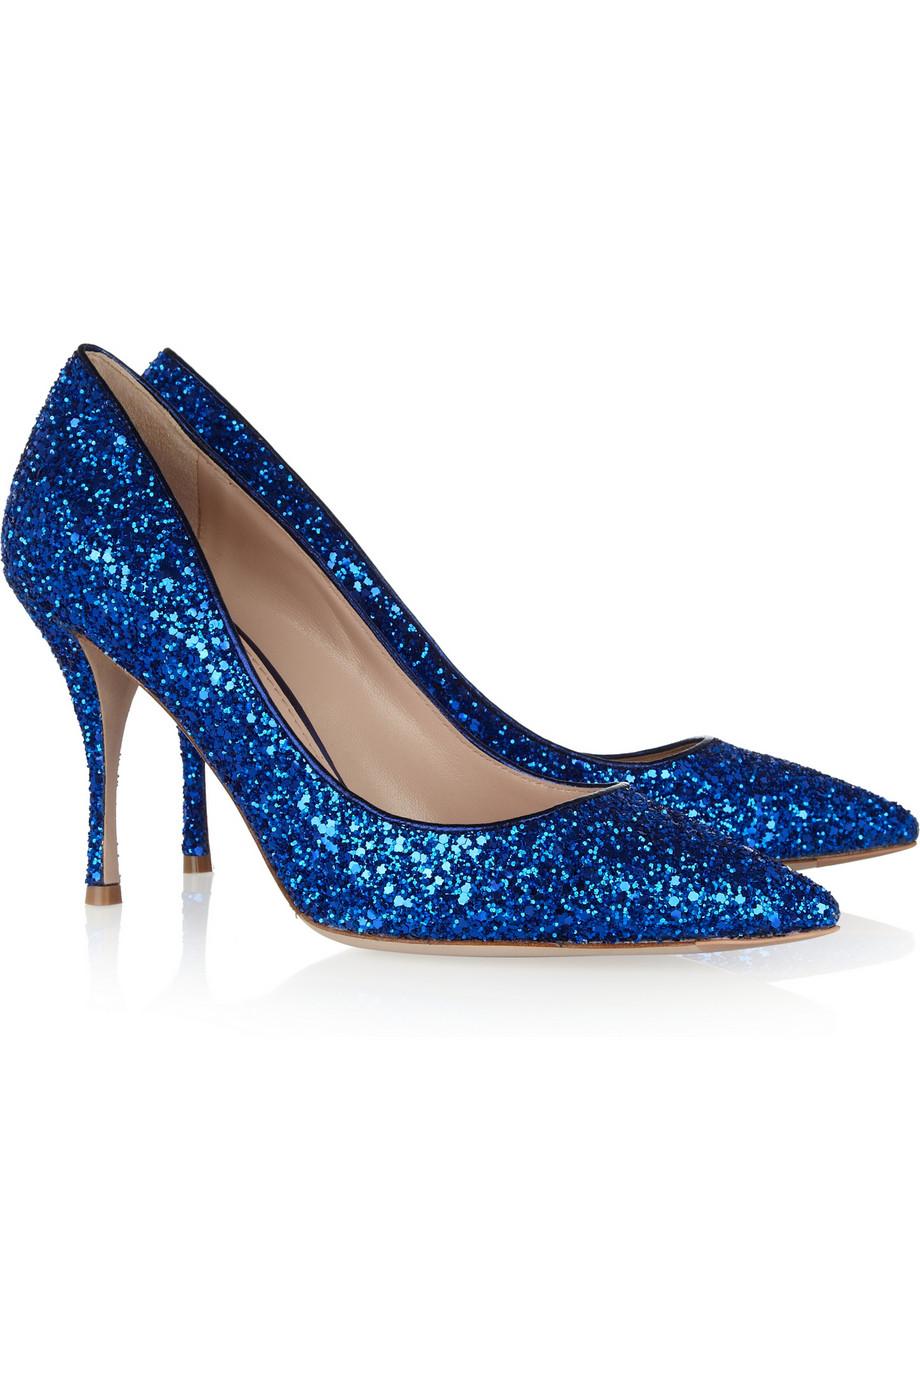 Glitter Blue Heels